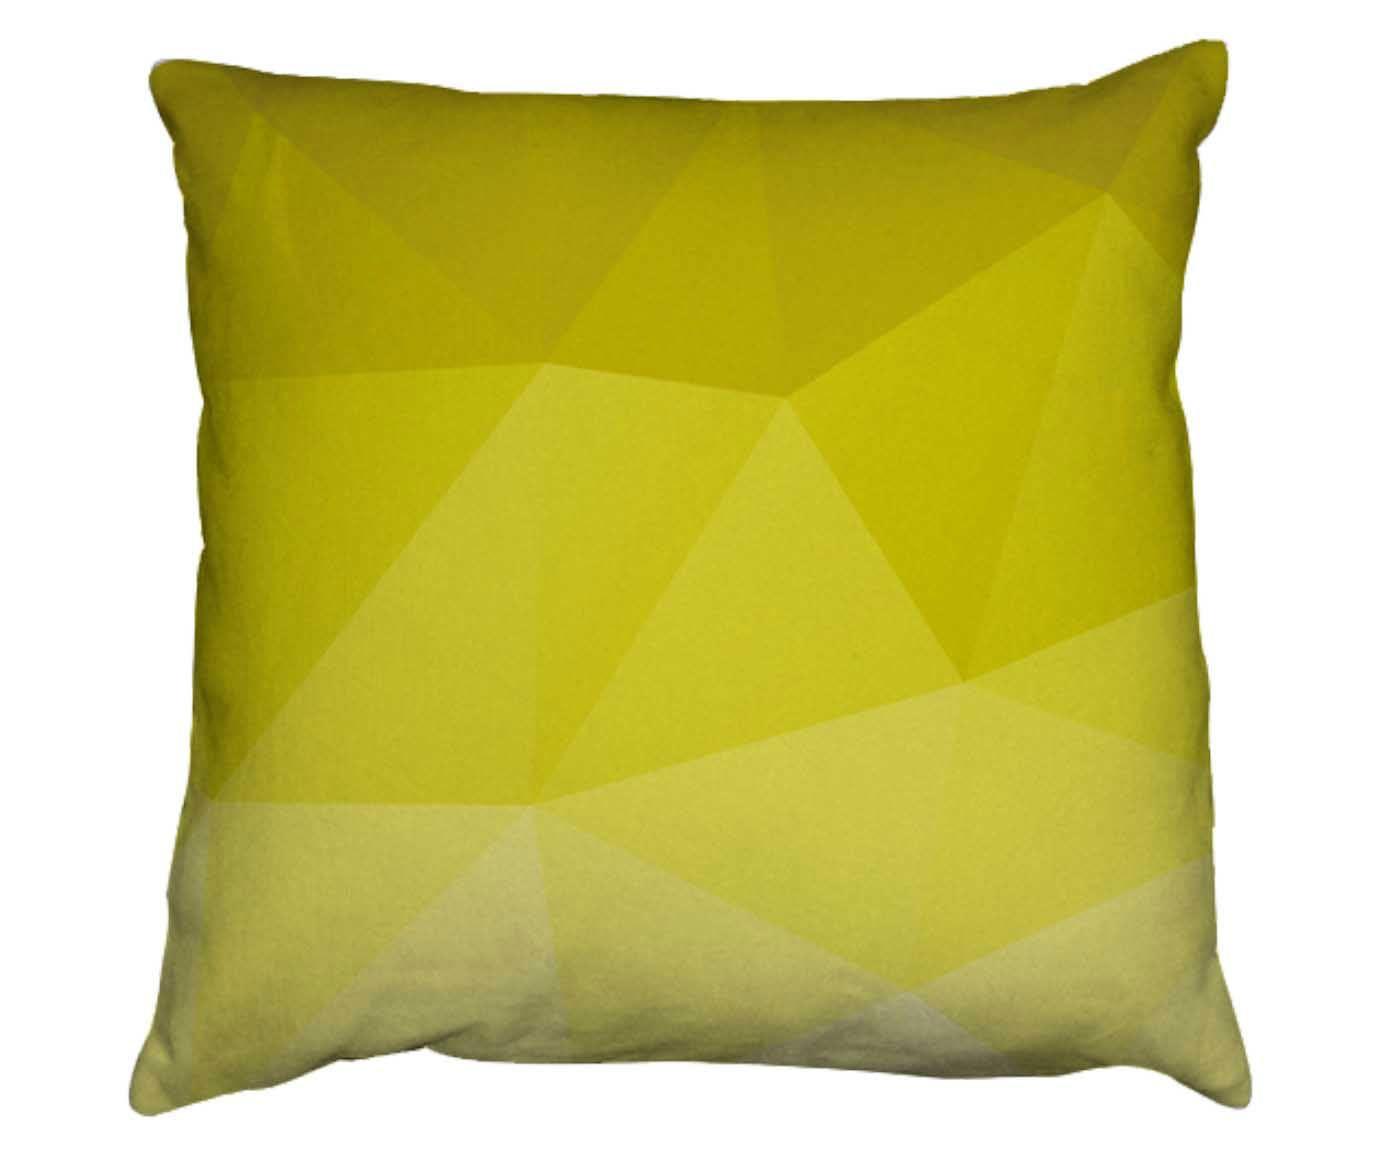 Capa para almofada cristal | Westwing.com.br